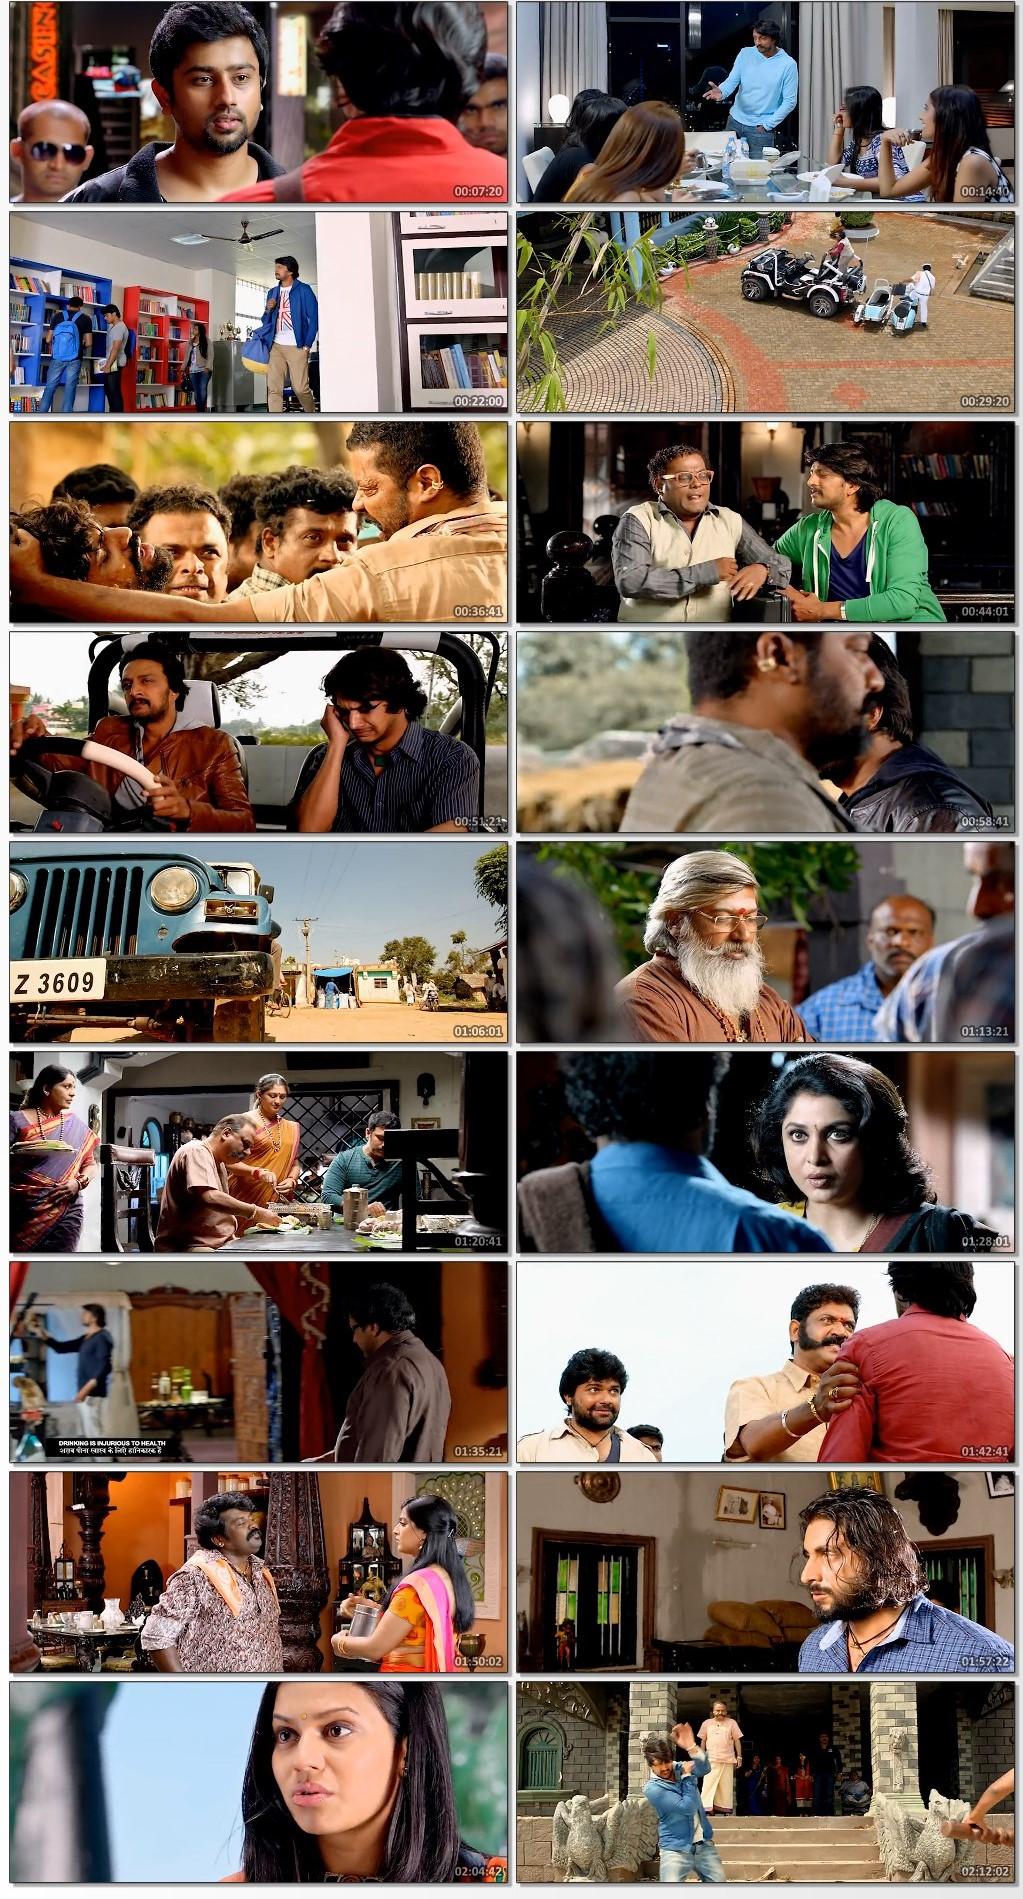 Maanikya-2014-Web-Rip-720p-Hindi-AAC-2-0-x264-mkv-thumbs